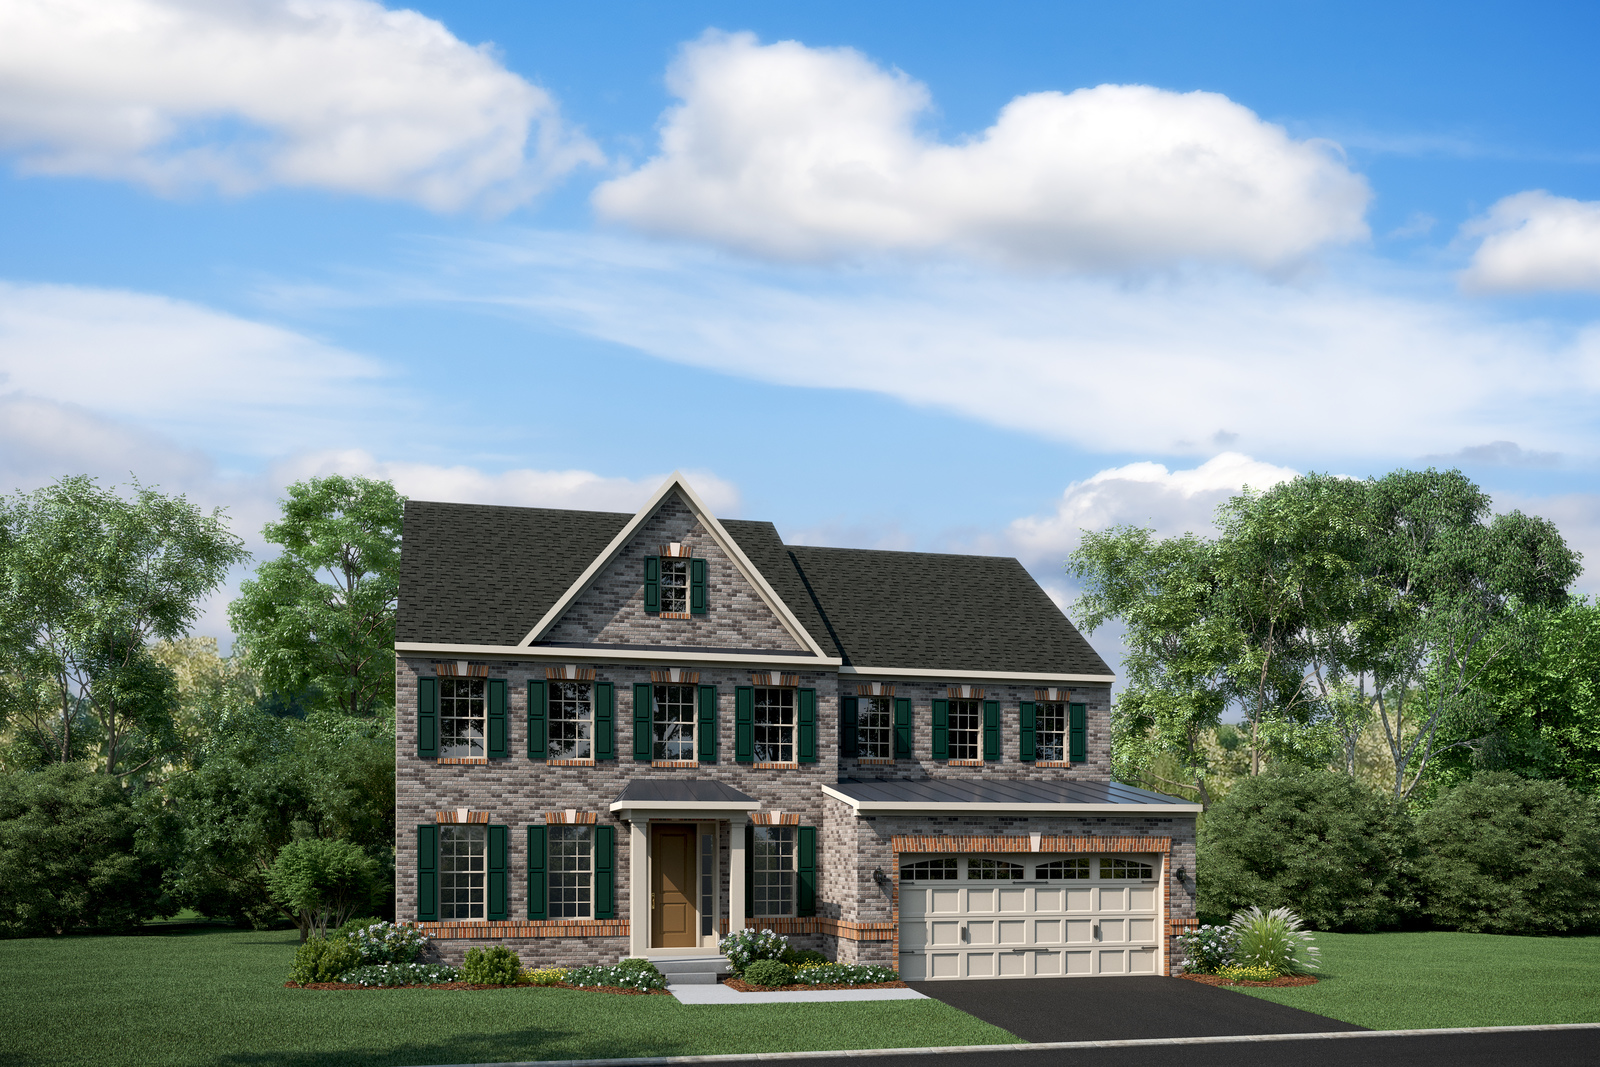 New Longwood Home Model For Sale Heartland Homes